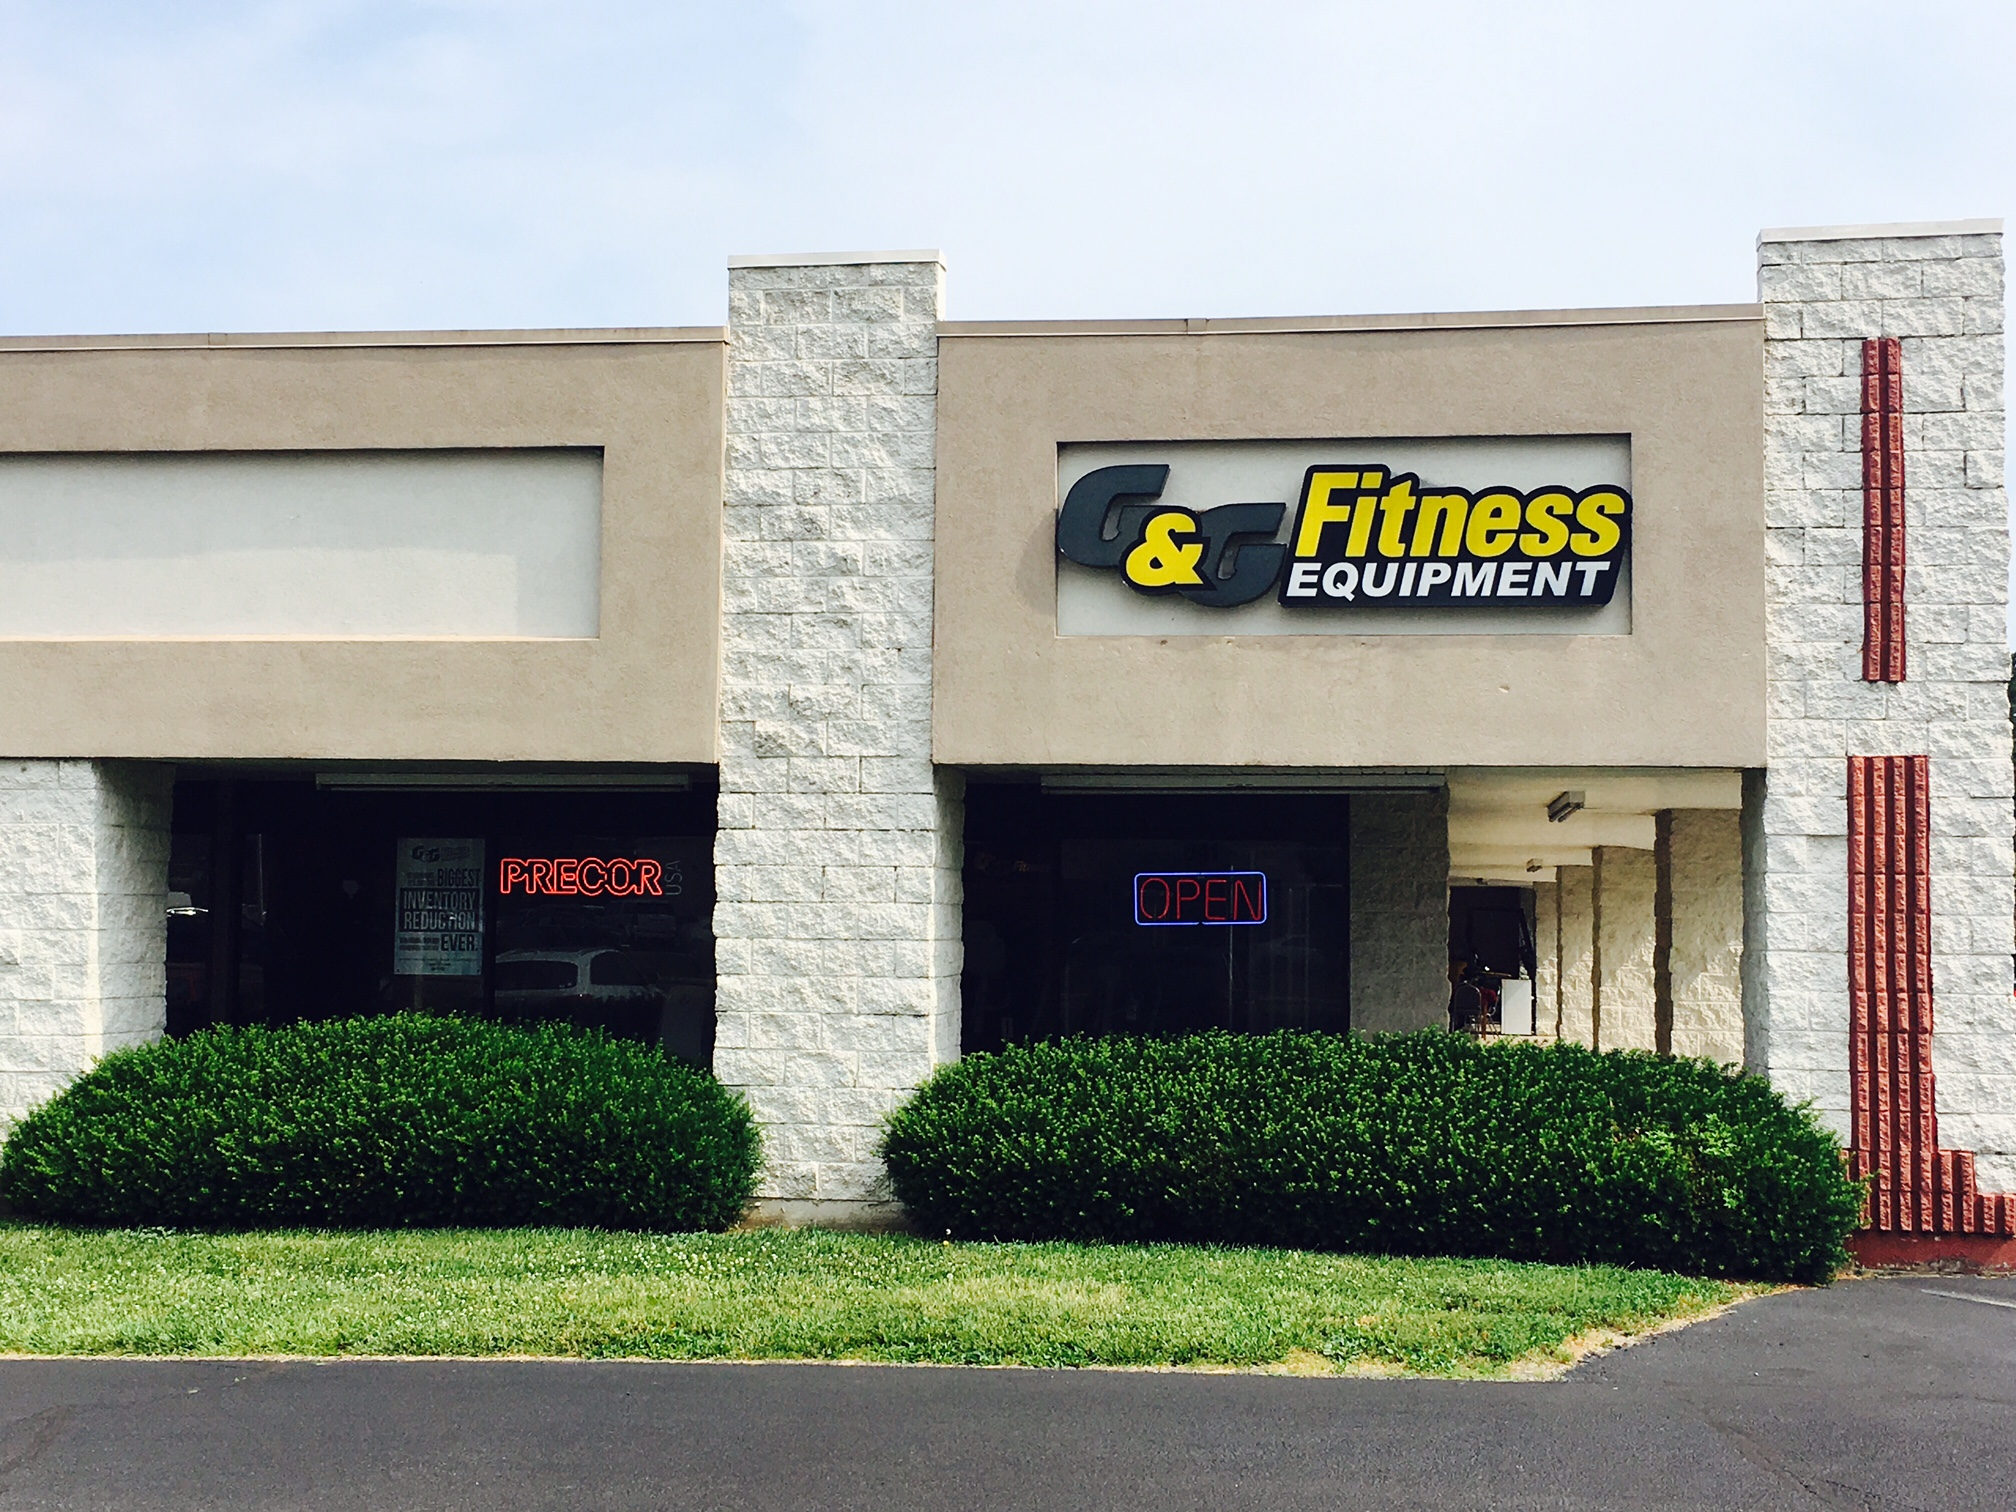 G&G Fitness Equipment - Dayton image 1